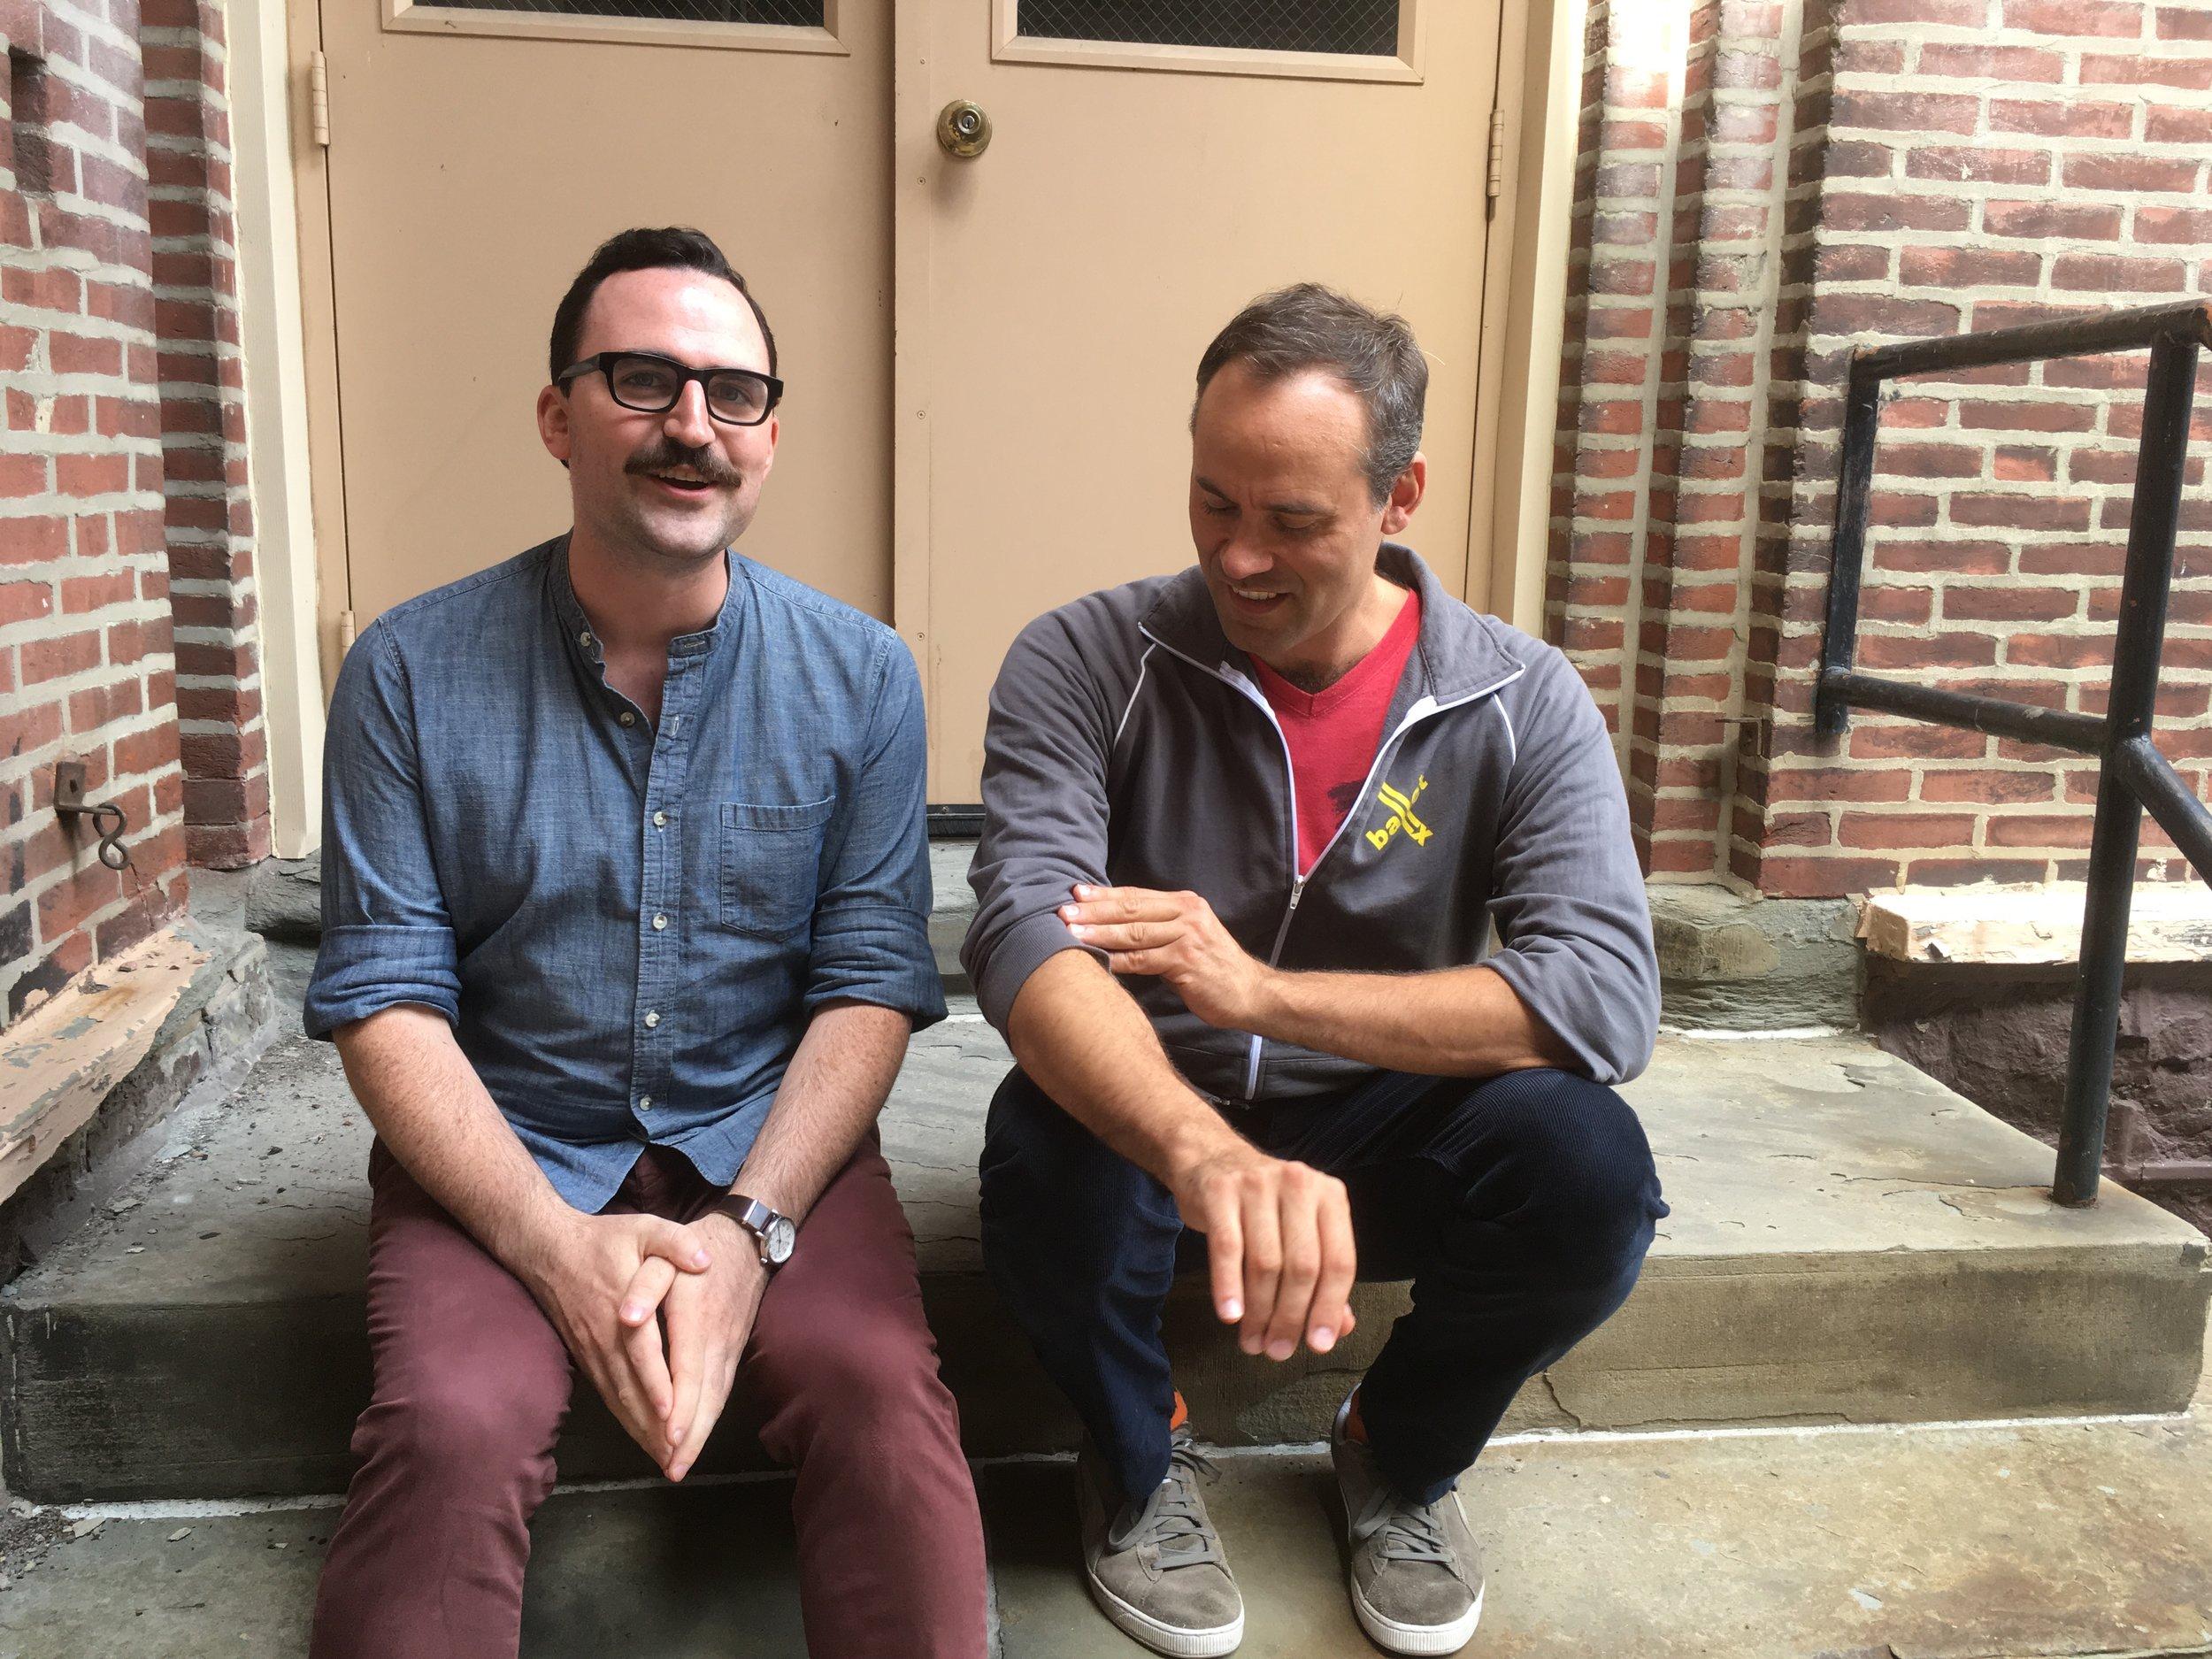 Dan O'Neil and Dito van Reigersberg on a break during  Buyer & Cellar  rehearsal.